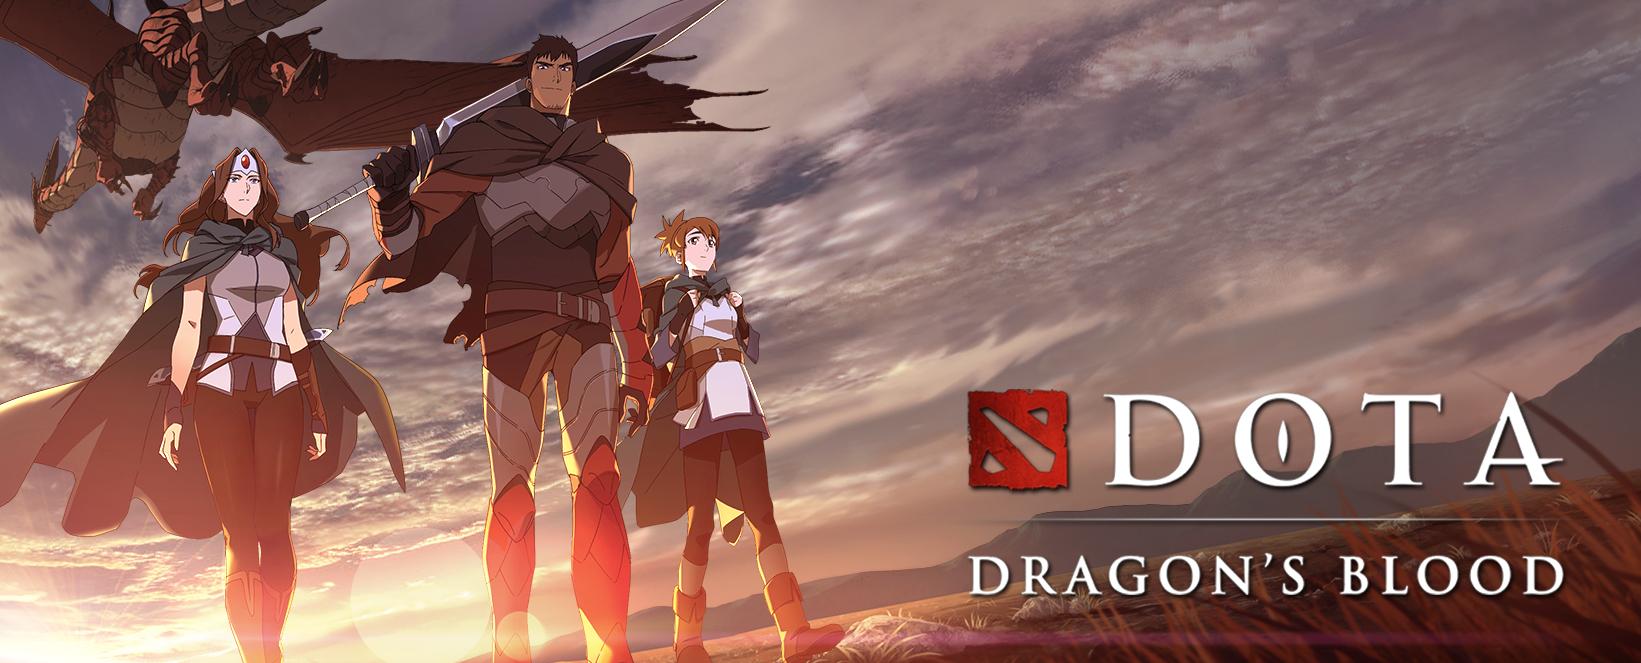 Valve telah bekerjasama dengan Netflix untuk menghasilkan sebuah siri animasi permainan, DOTA 2: Dragon's Blood.